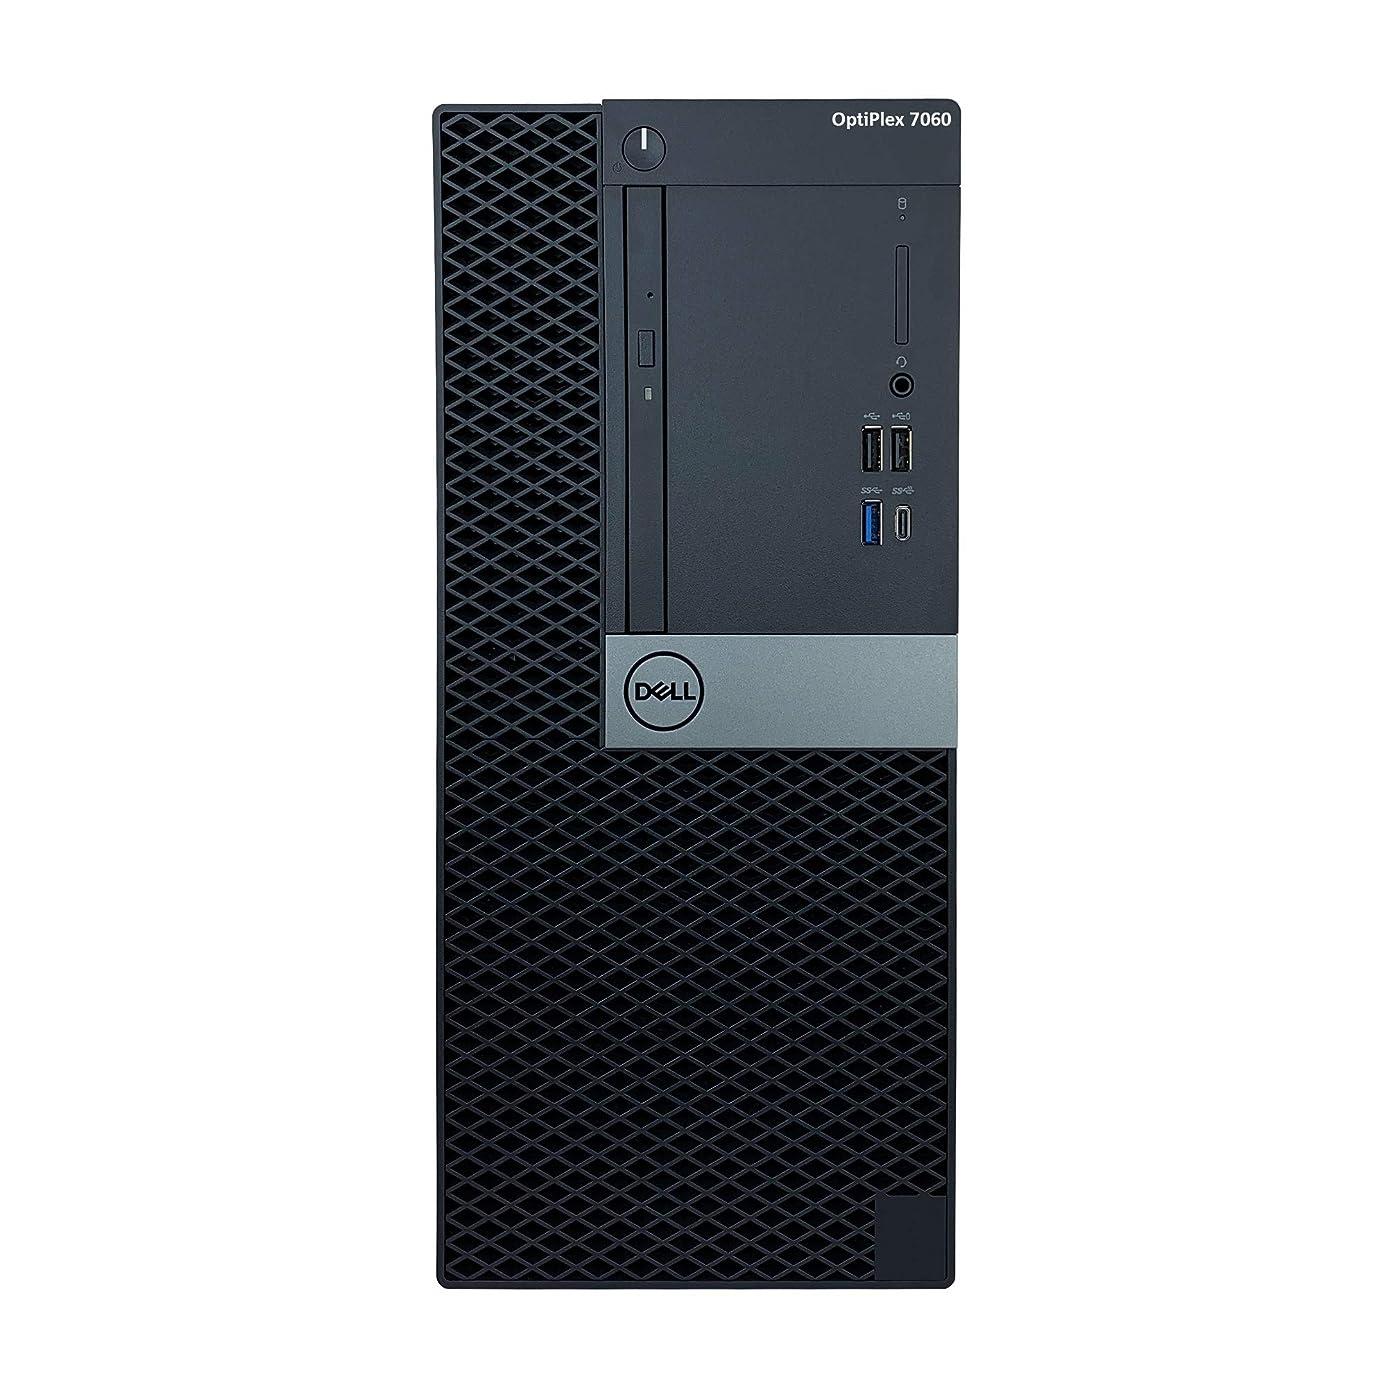 Dell Optiplex 5060 Tower Desktop - 8th Gen Intel Core i5-8500 3.00GHz (Up to 4.10GHz), 32GB DDR4 2666MHz Memory, 1TB 7200 RPM Hard Drive, Intel UHD Graphics 630, Windows 10 Pro